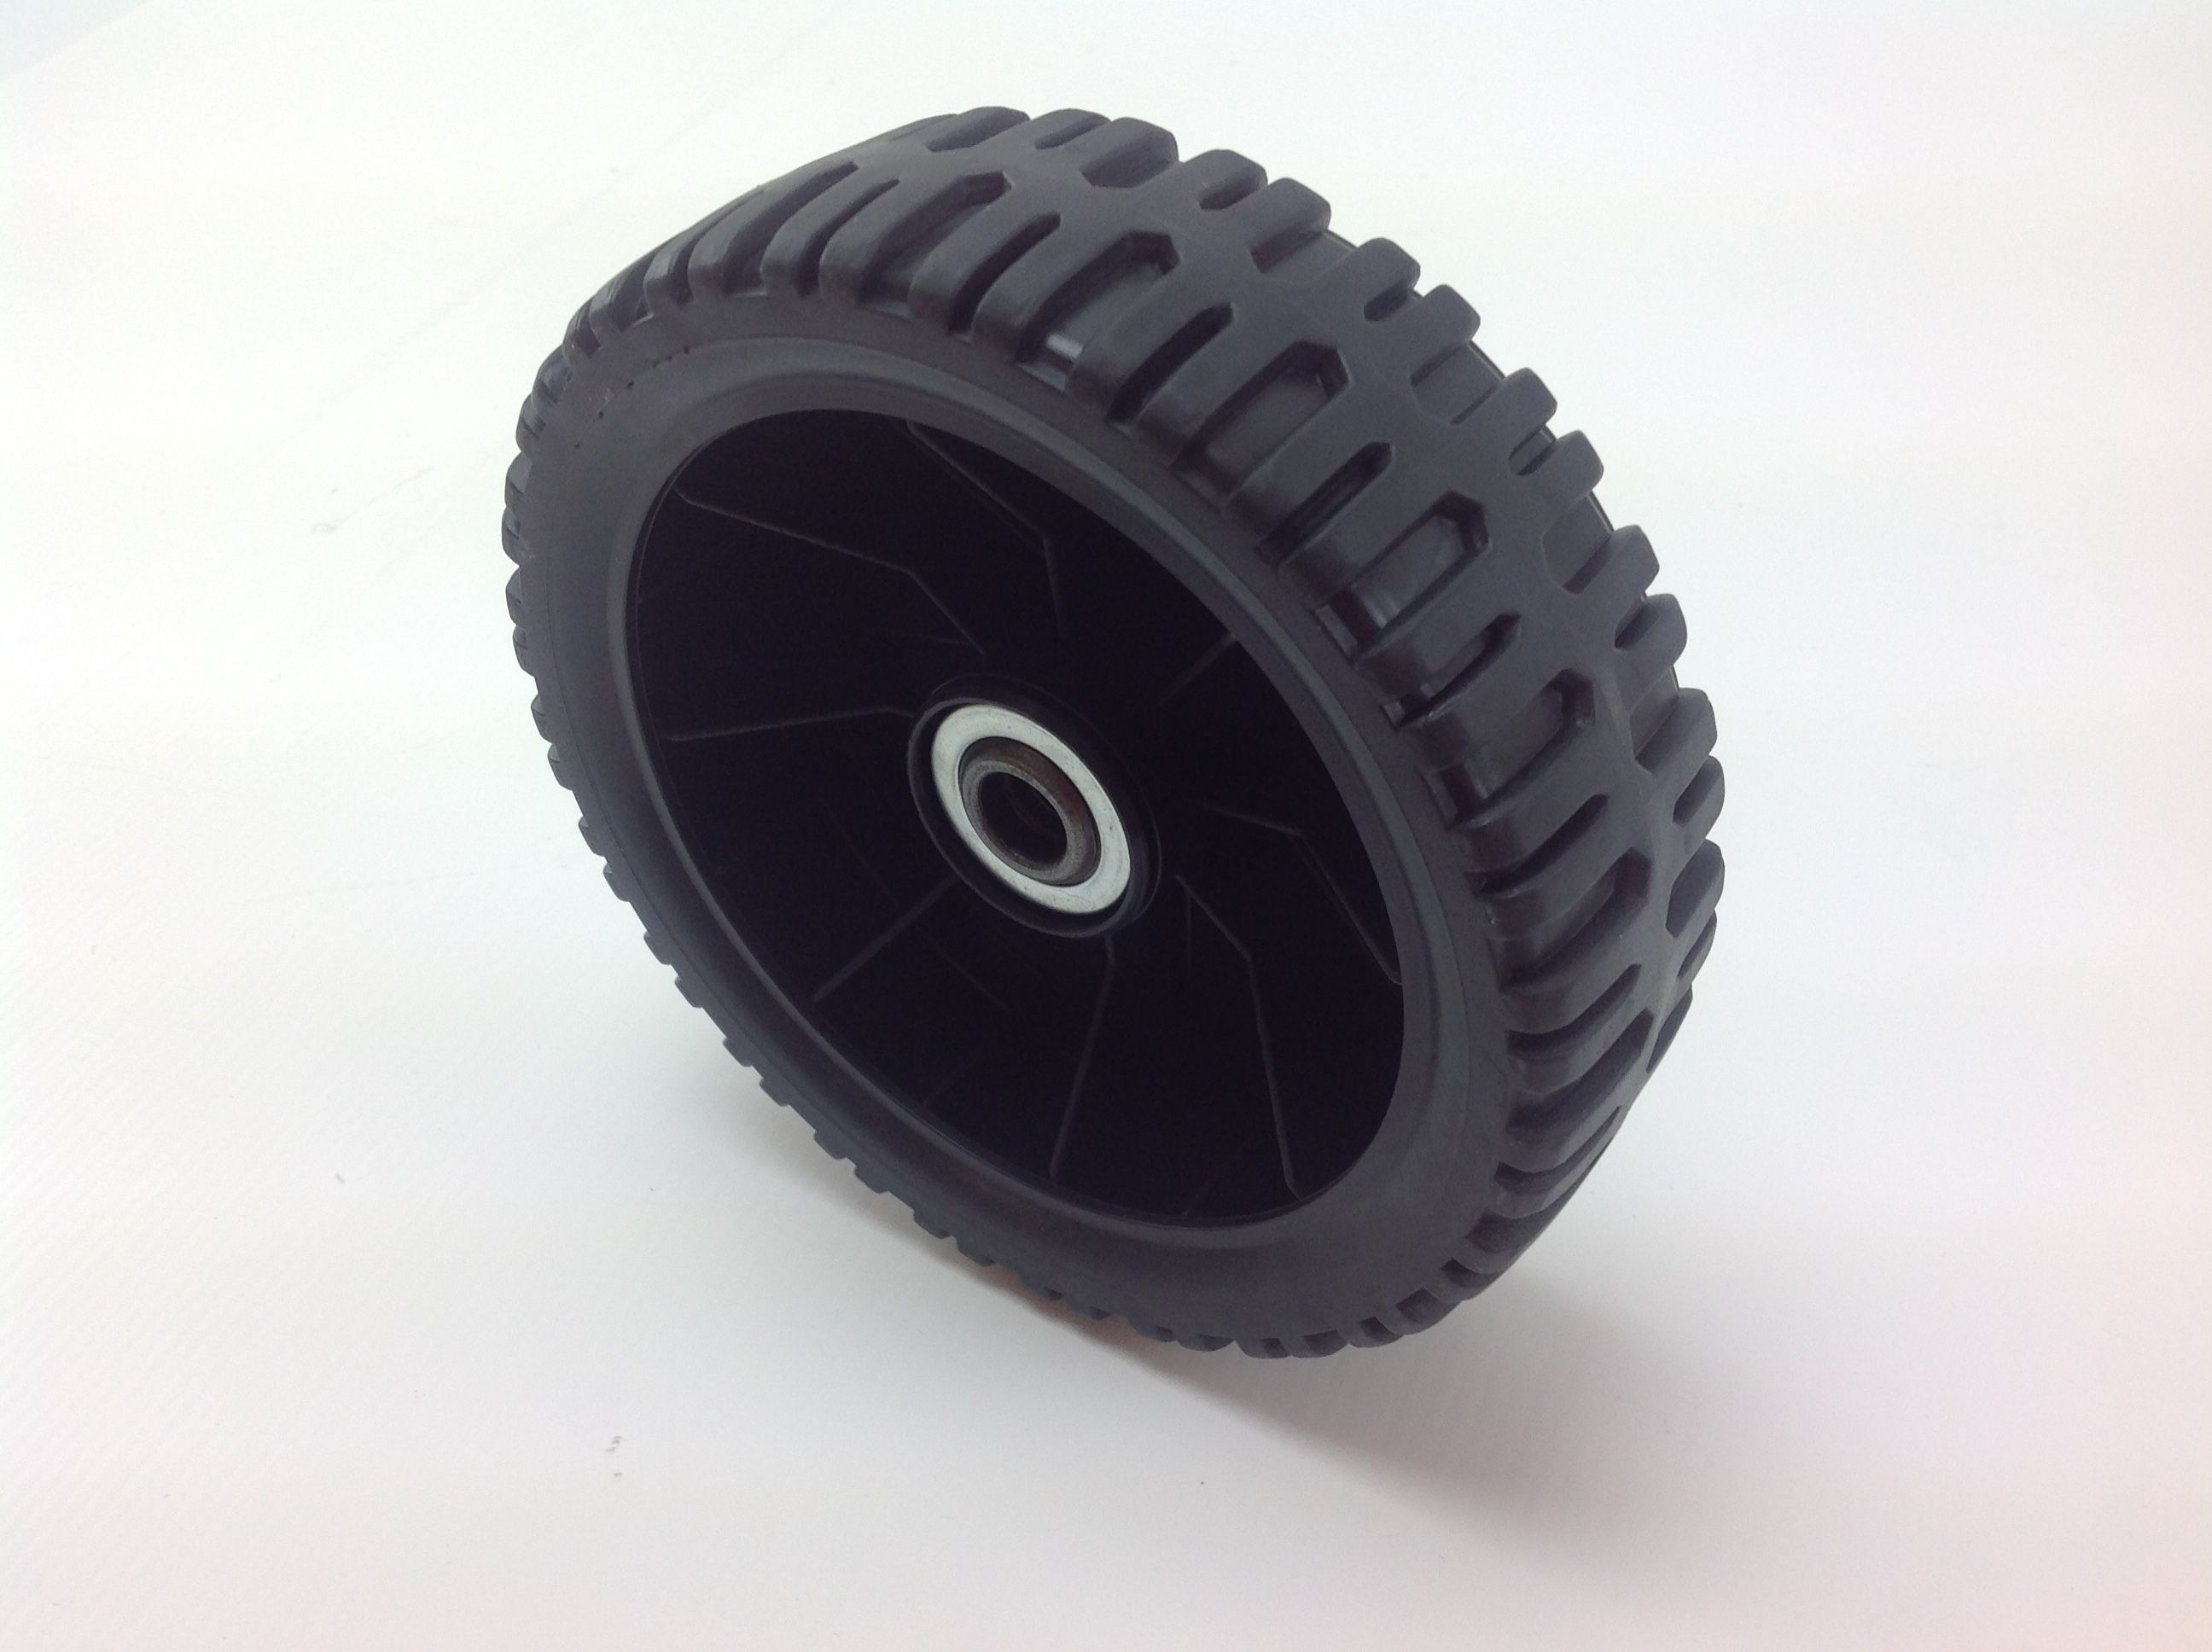 Ruota-tosaerba-rasaerba-tagliaerba-UNIVERSALE-150-180-200-mm-tutte-le-macchine miniatuur 6